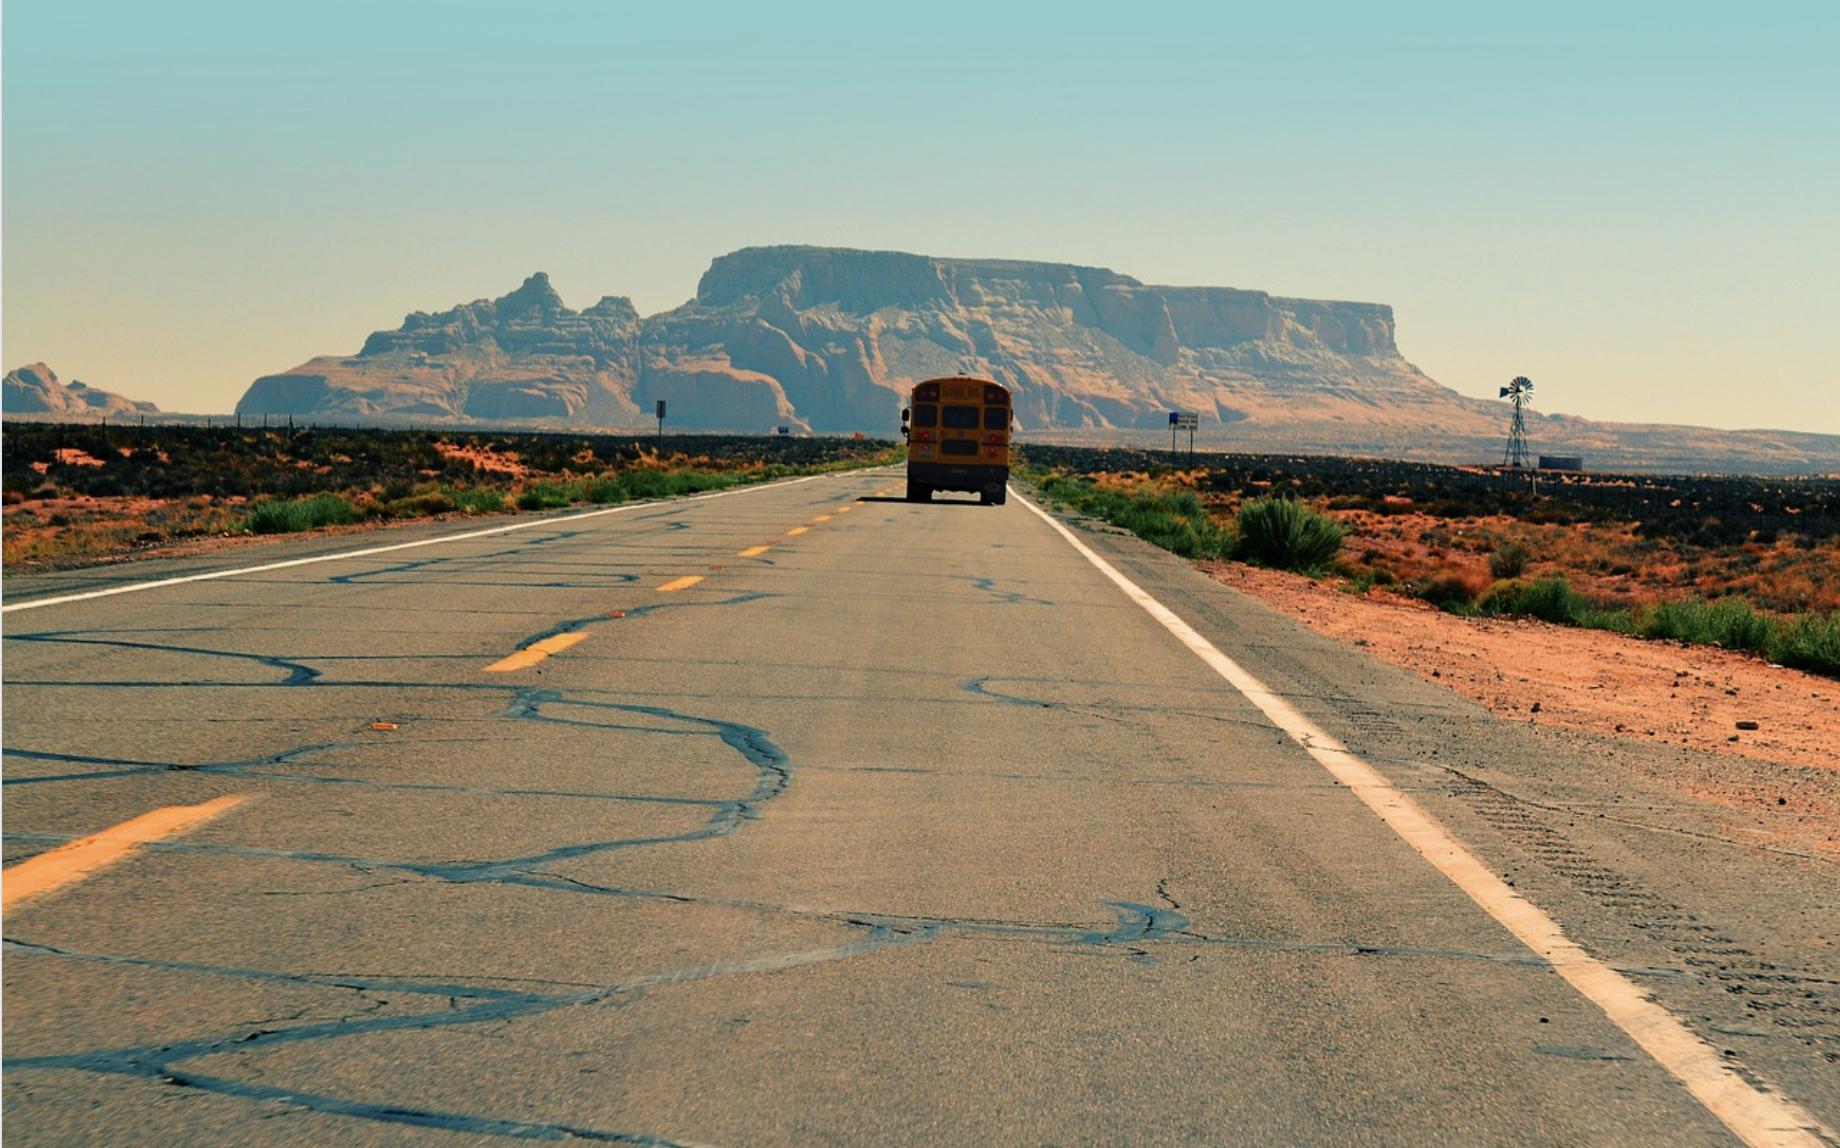 SCHOOL BUS DRIVING DOWN ROAD